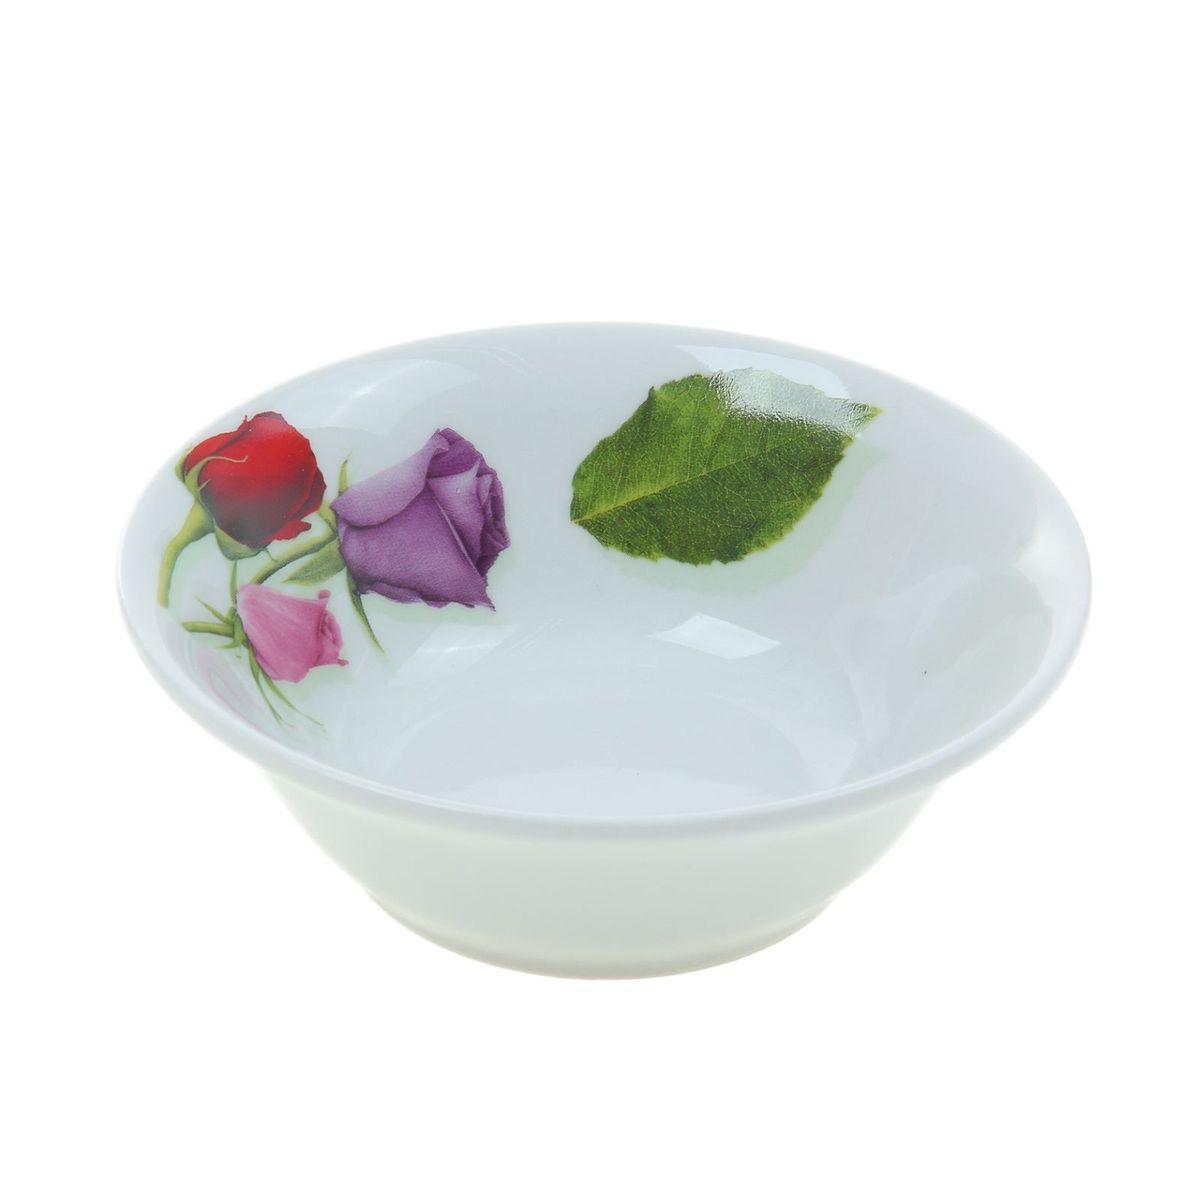 Салатник Идиллия. Королева цветов, 360 мл4С0313